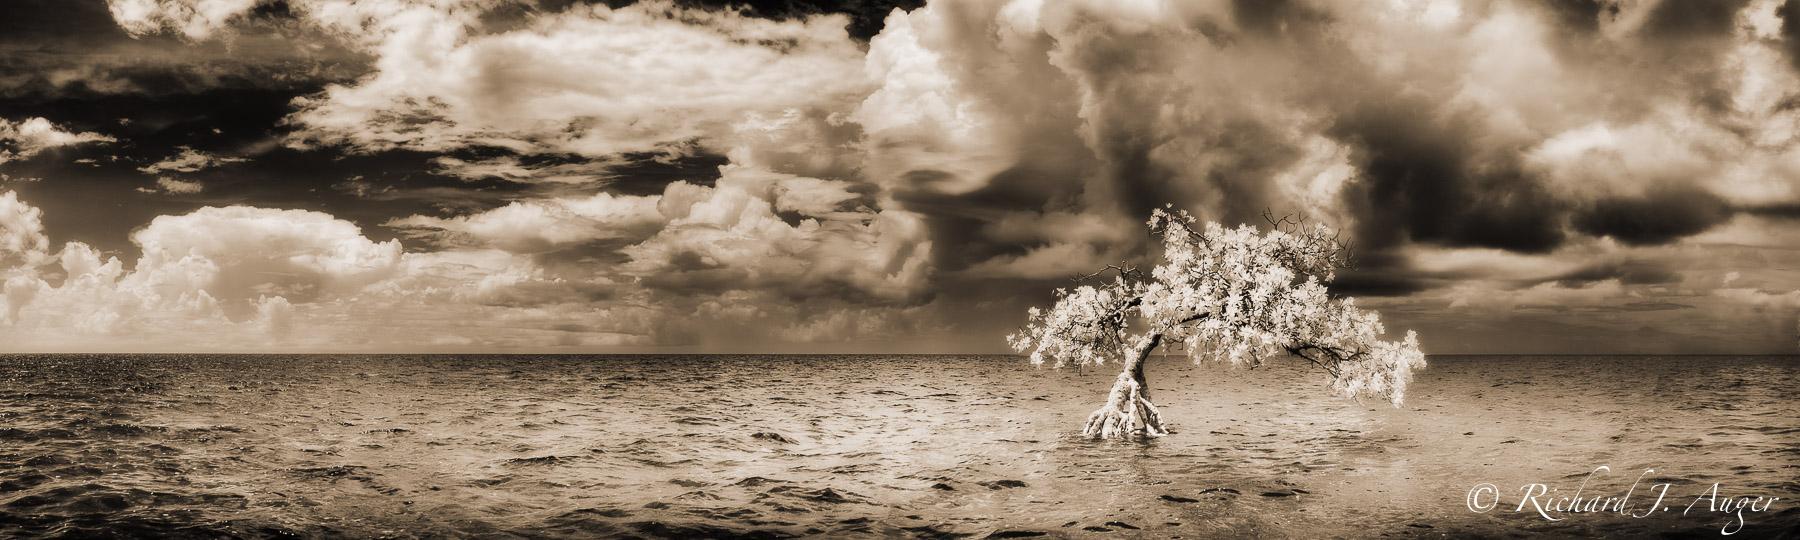 Long Mangrove State Park, Florida Keys, Storm, Moody, Sepia, Monochrome, light, photograph, photographer, water, landscape, sepia tone, black and white, panorama